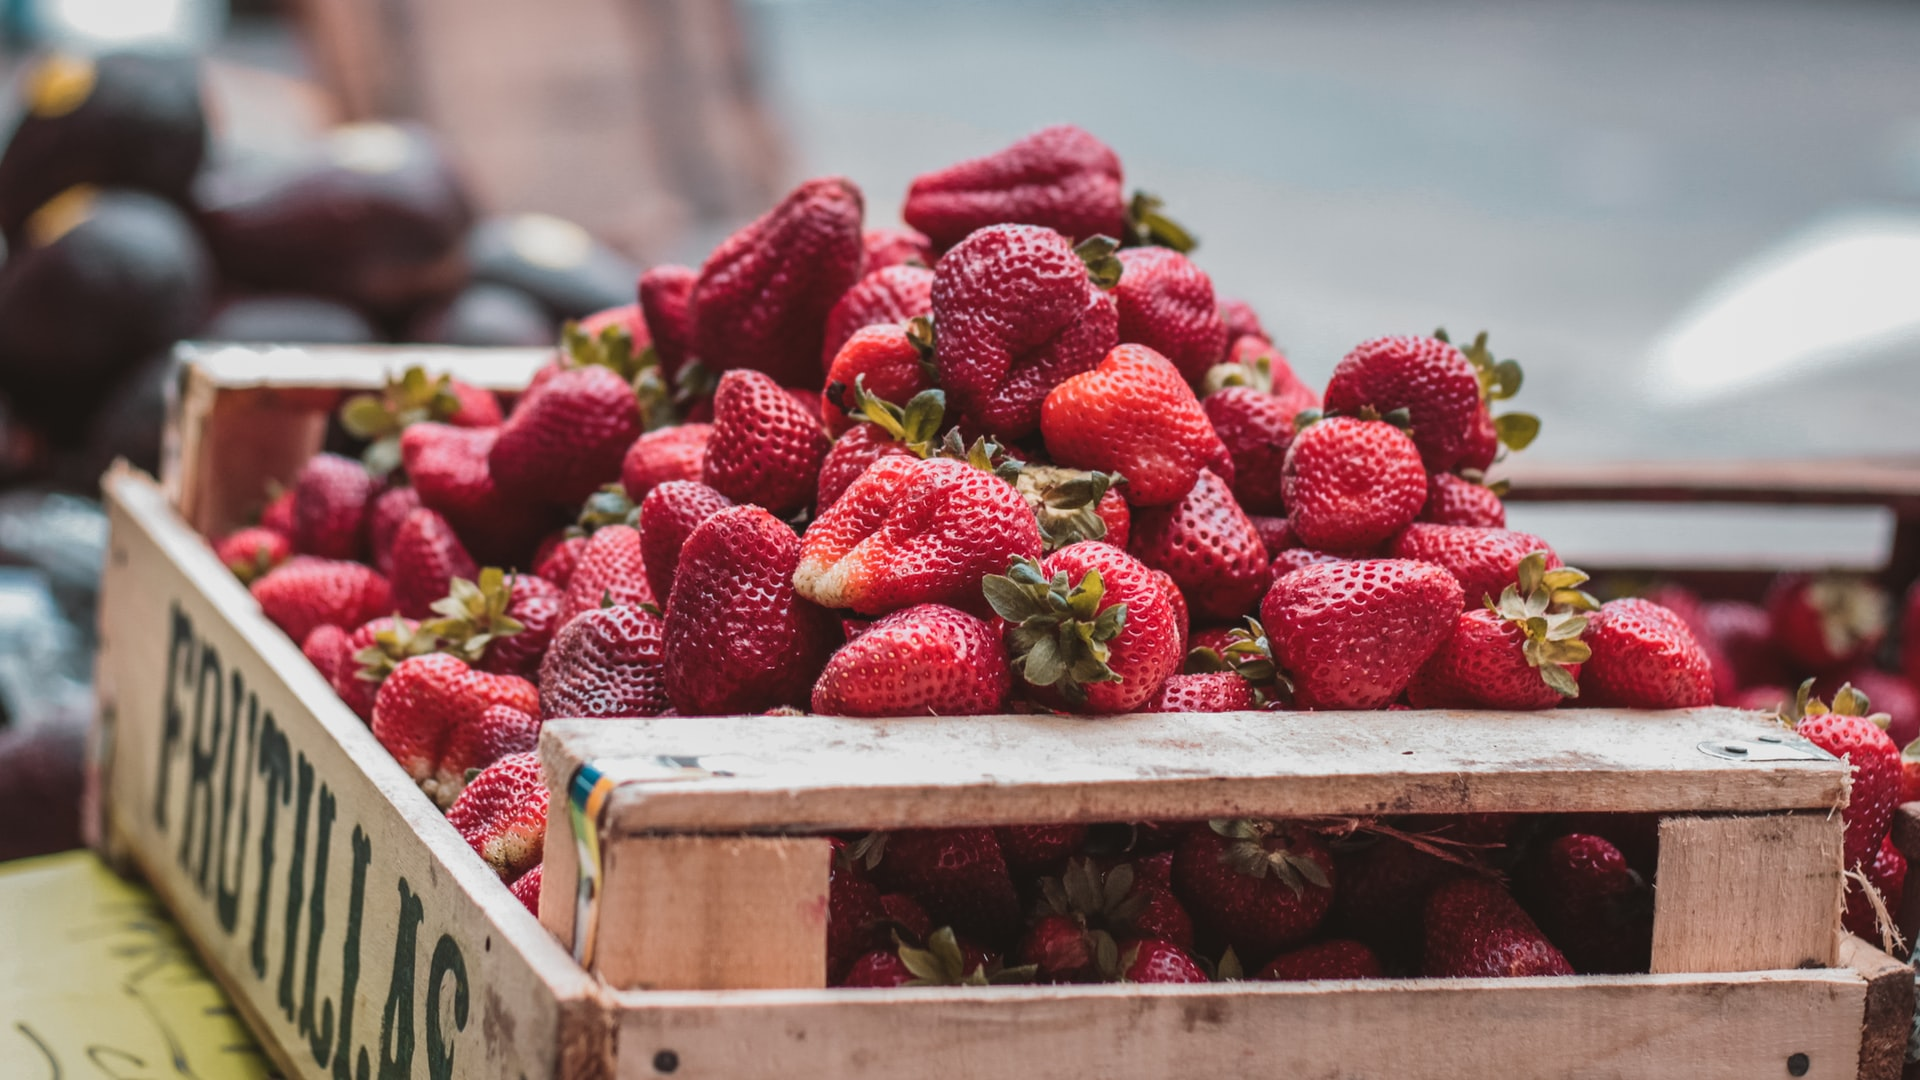 Stock Up on Seasonal Produce at Freshfarm